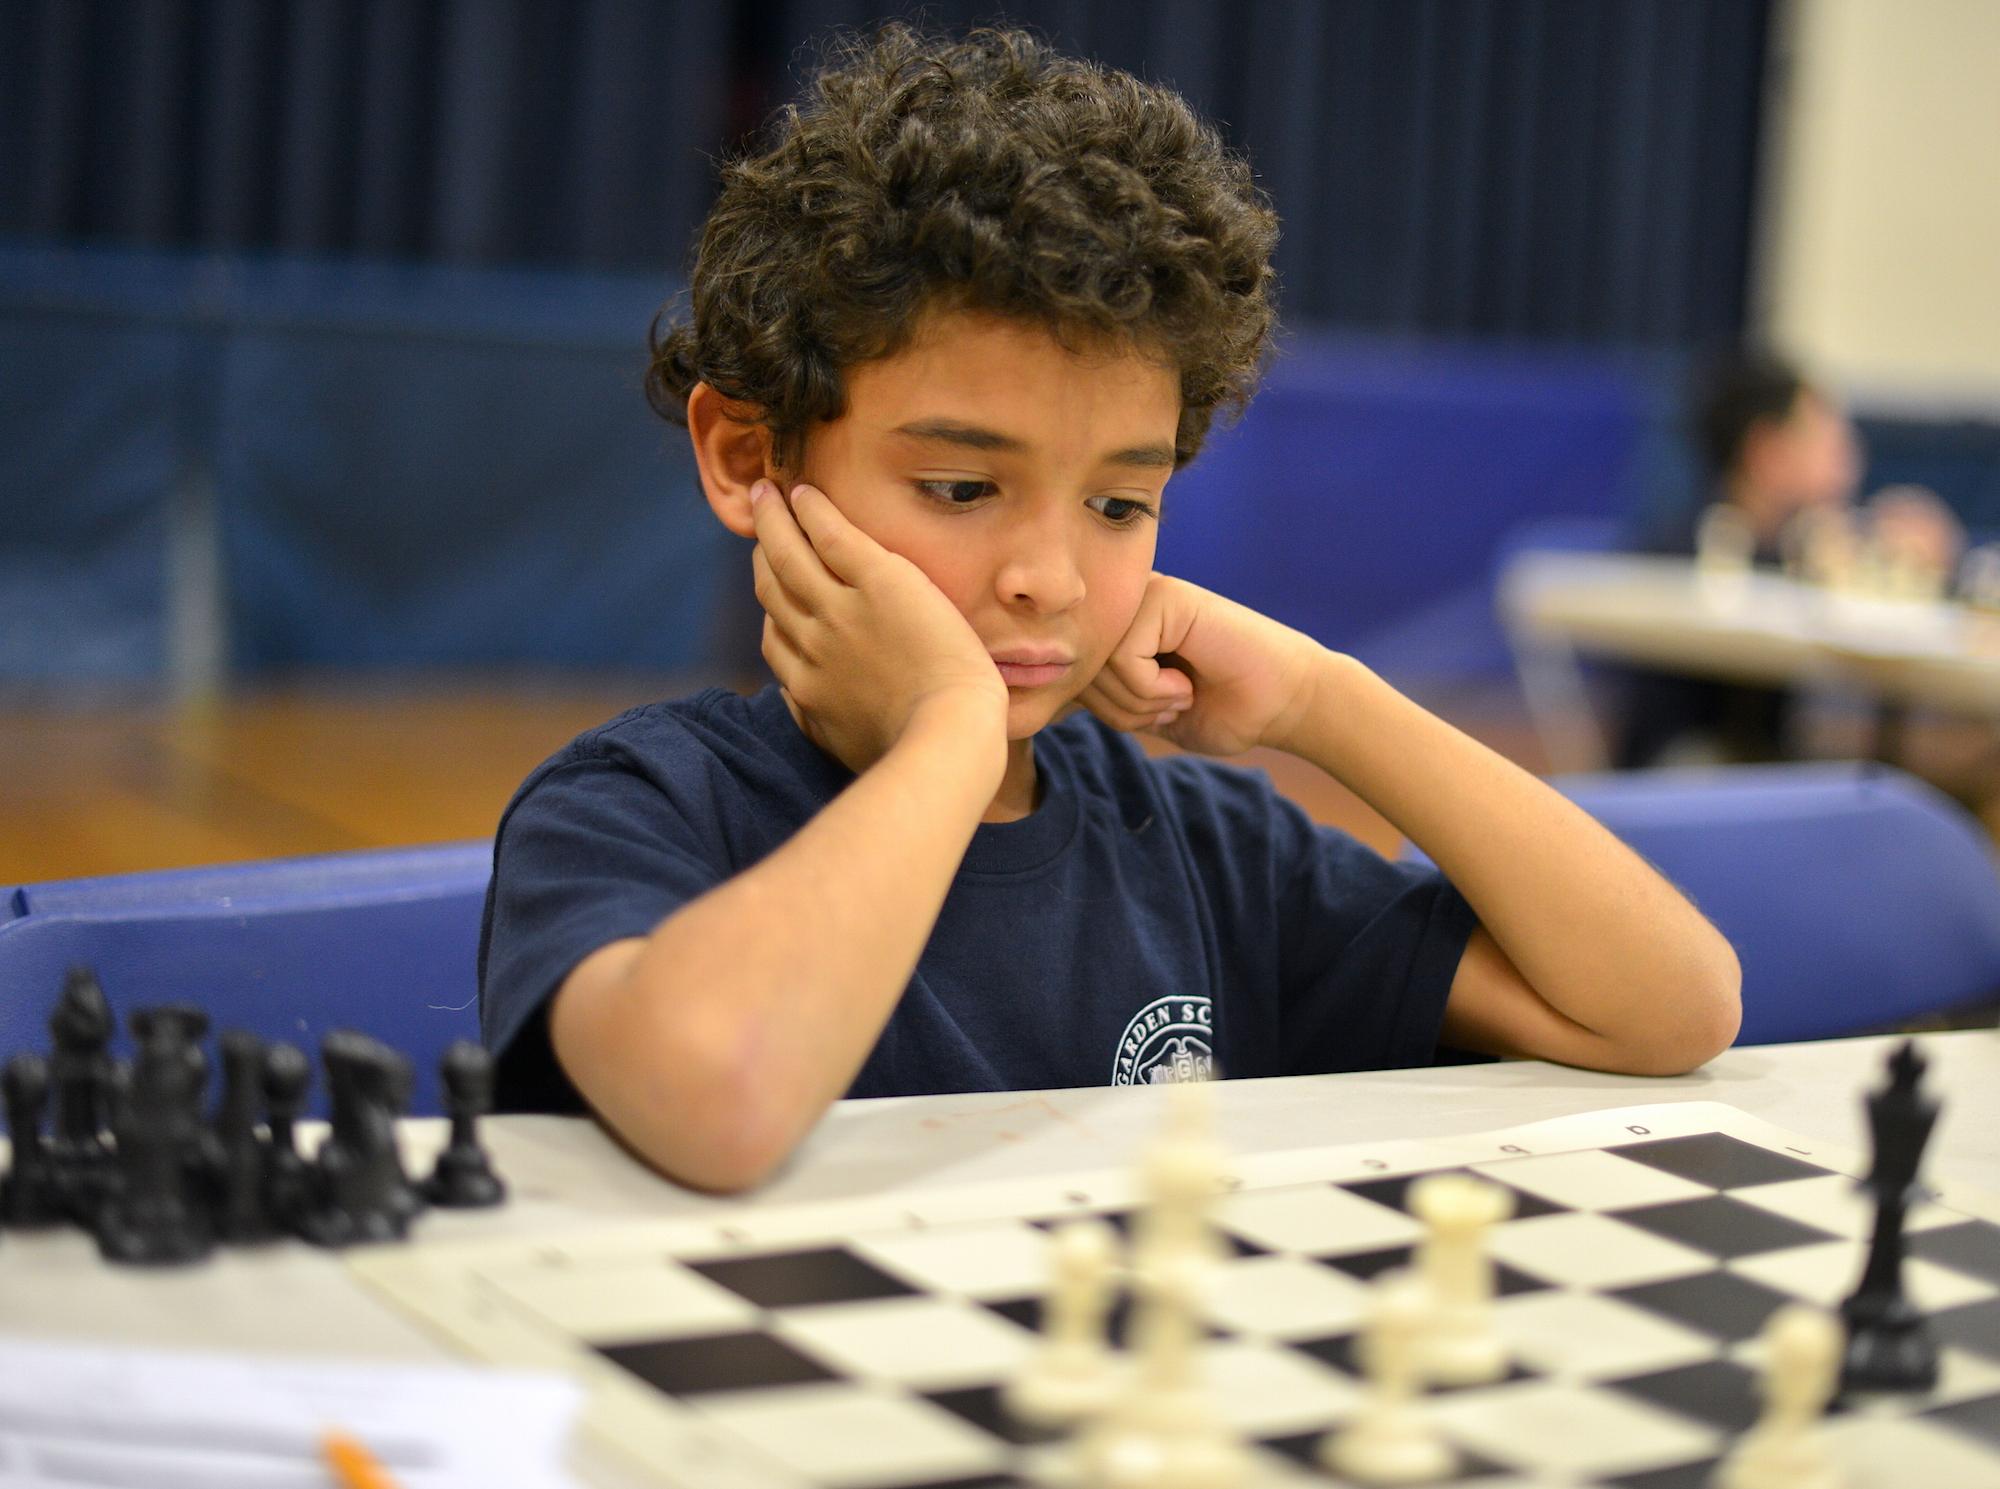 Garden School Chess Tournament Dec. 27, 2015